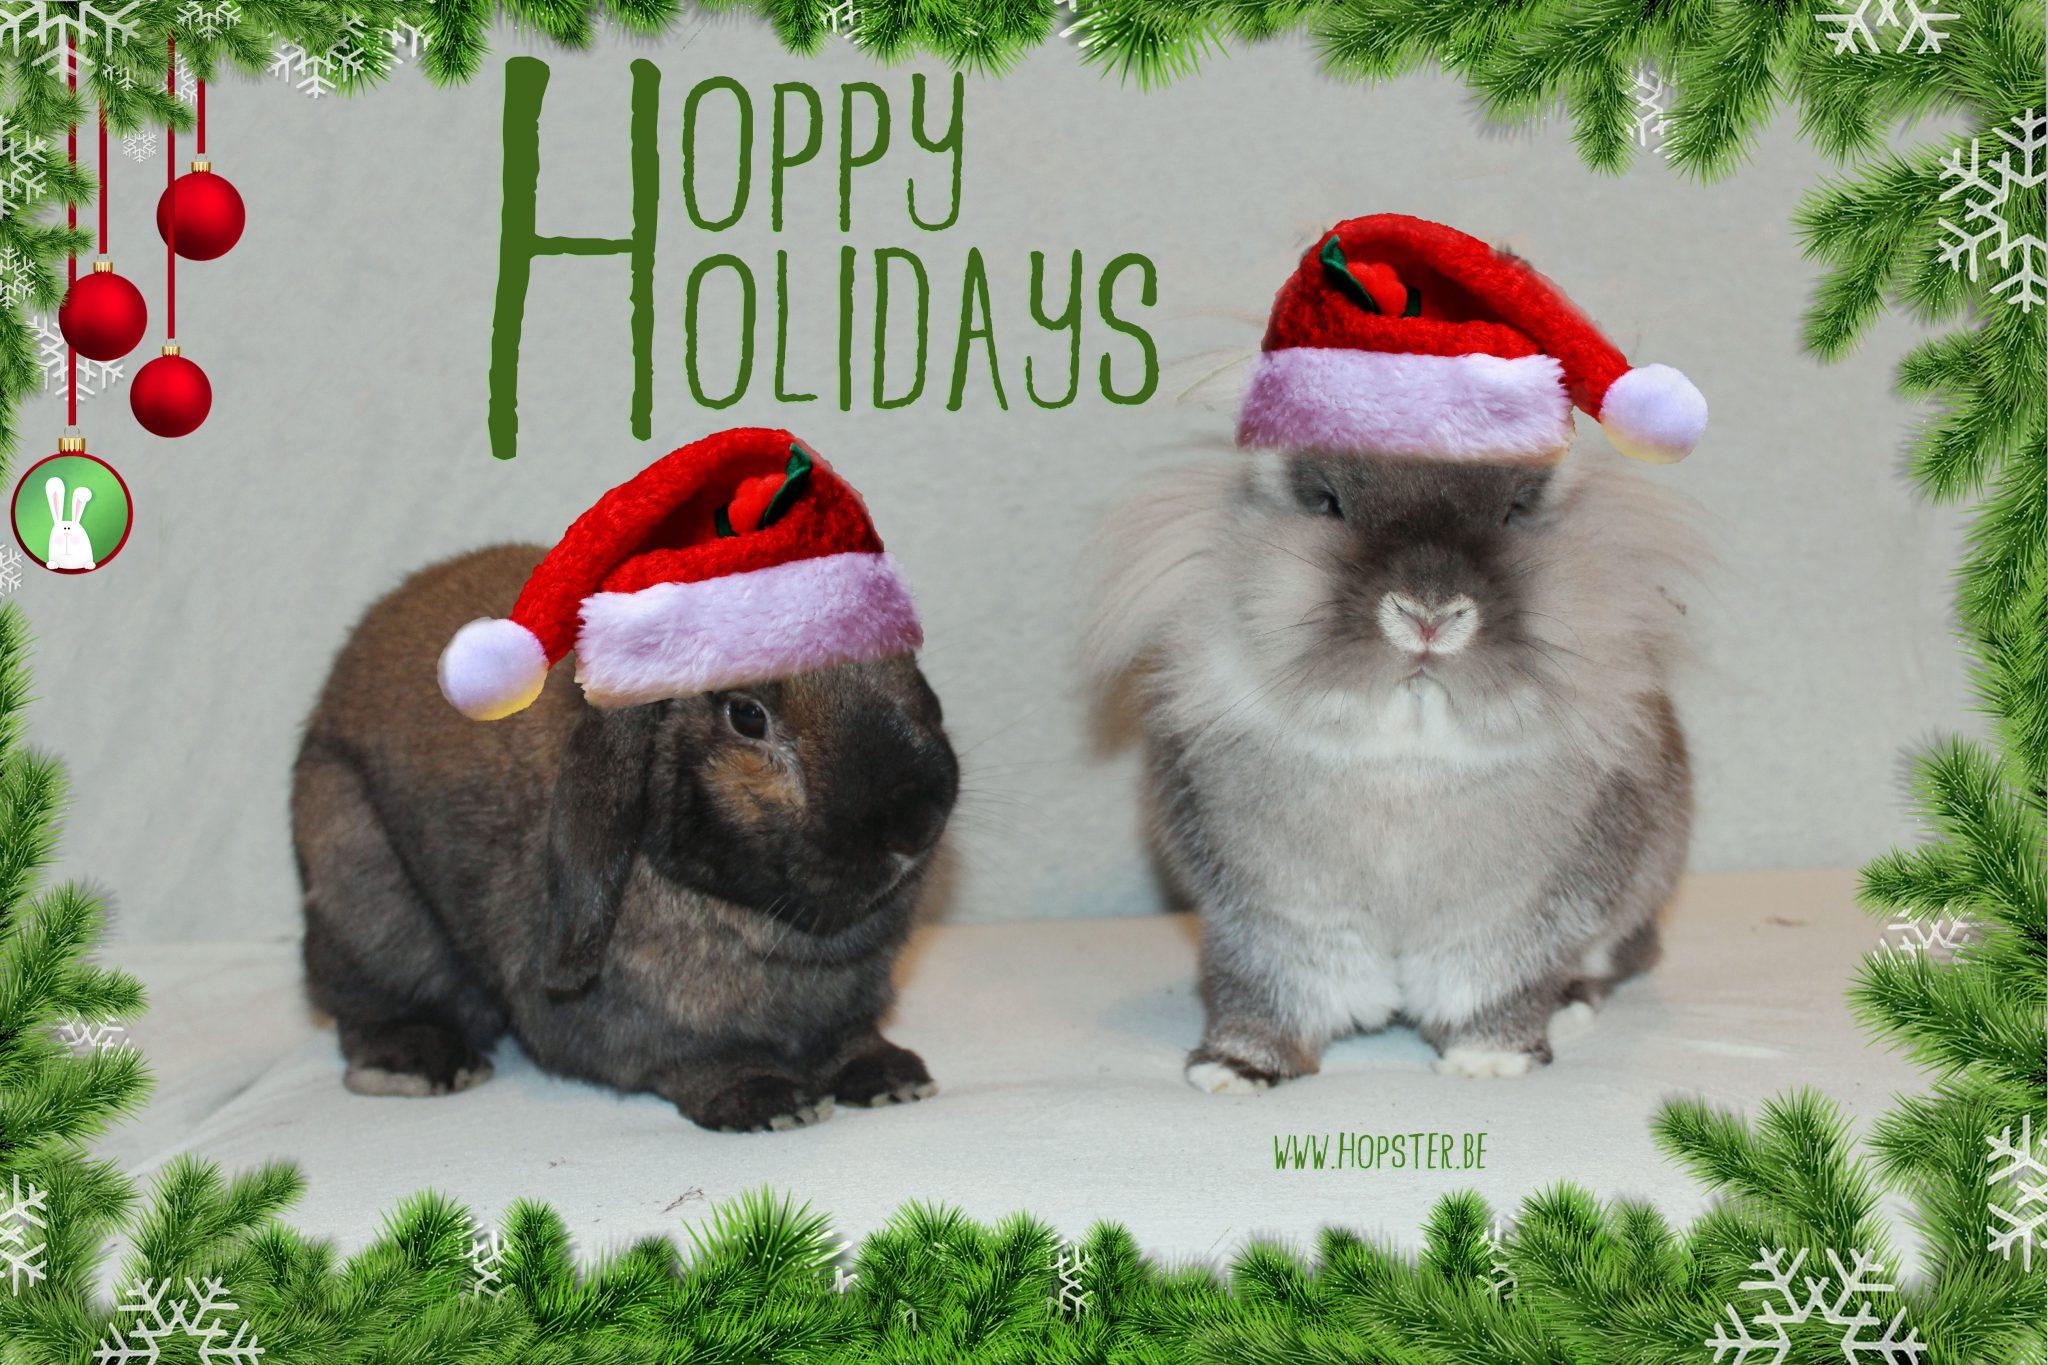 Hoppy Holidays | Konijnenadviesbureau Hopster